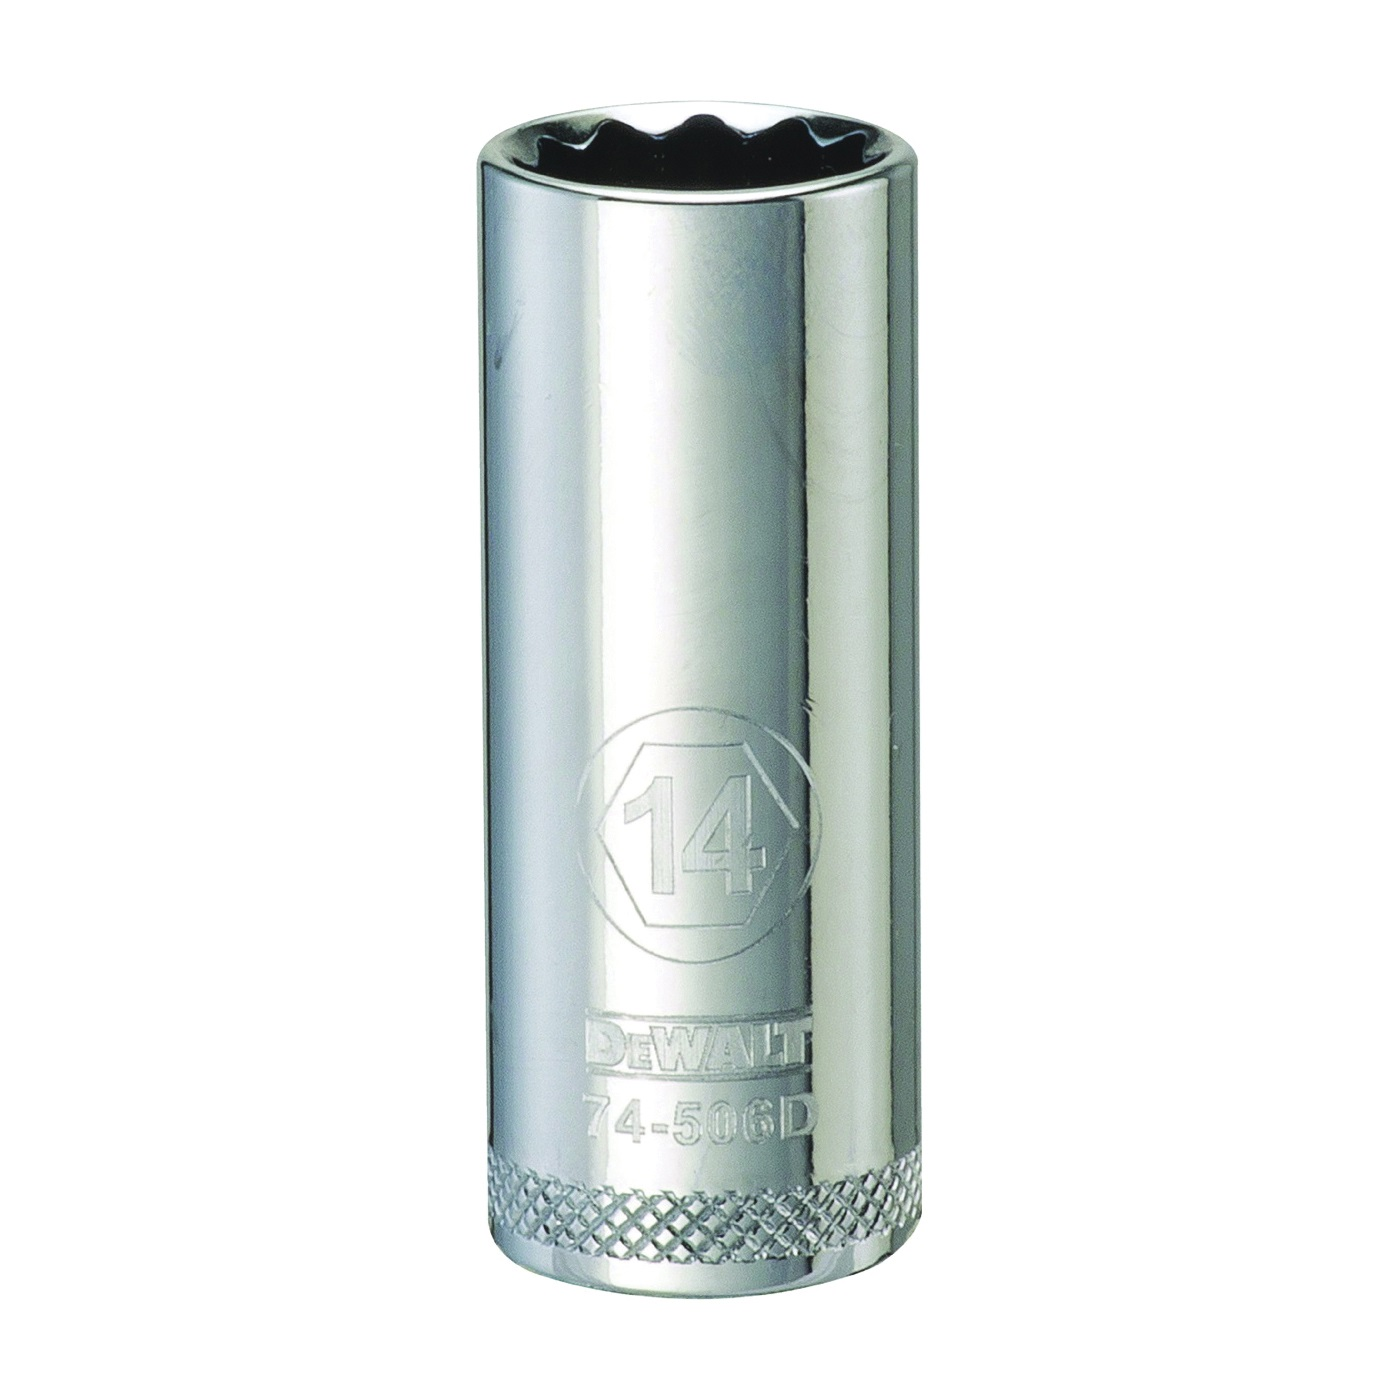 Picture of DeWALT DWMT74506OSP Drive Socket, 14 mm Socket, 3/8 in Drive, 12 -Point, Vanadium Steel, Polished Chrome